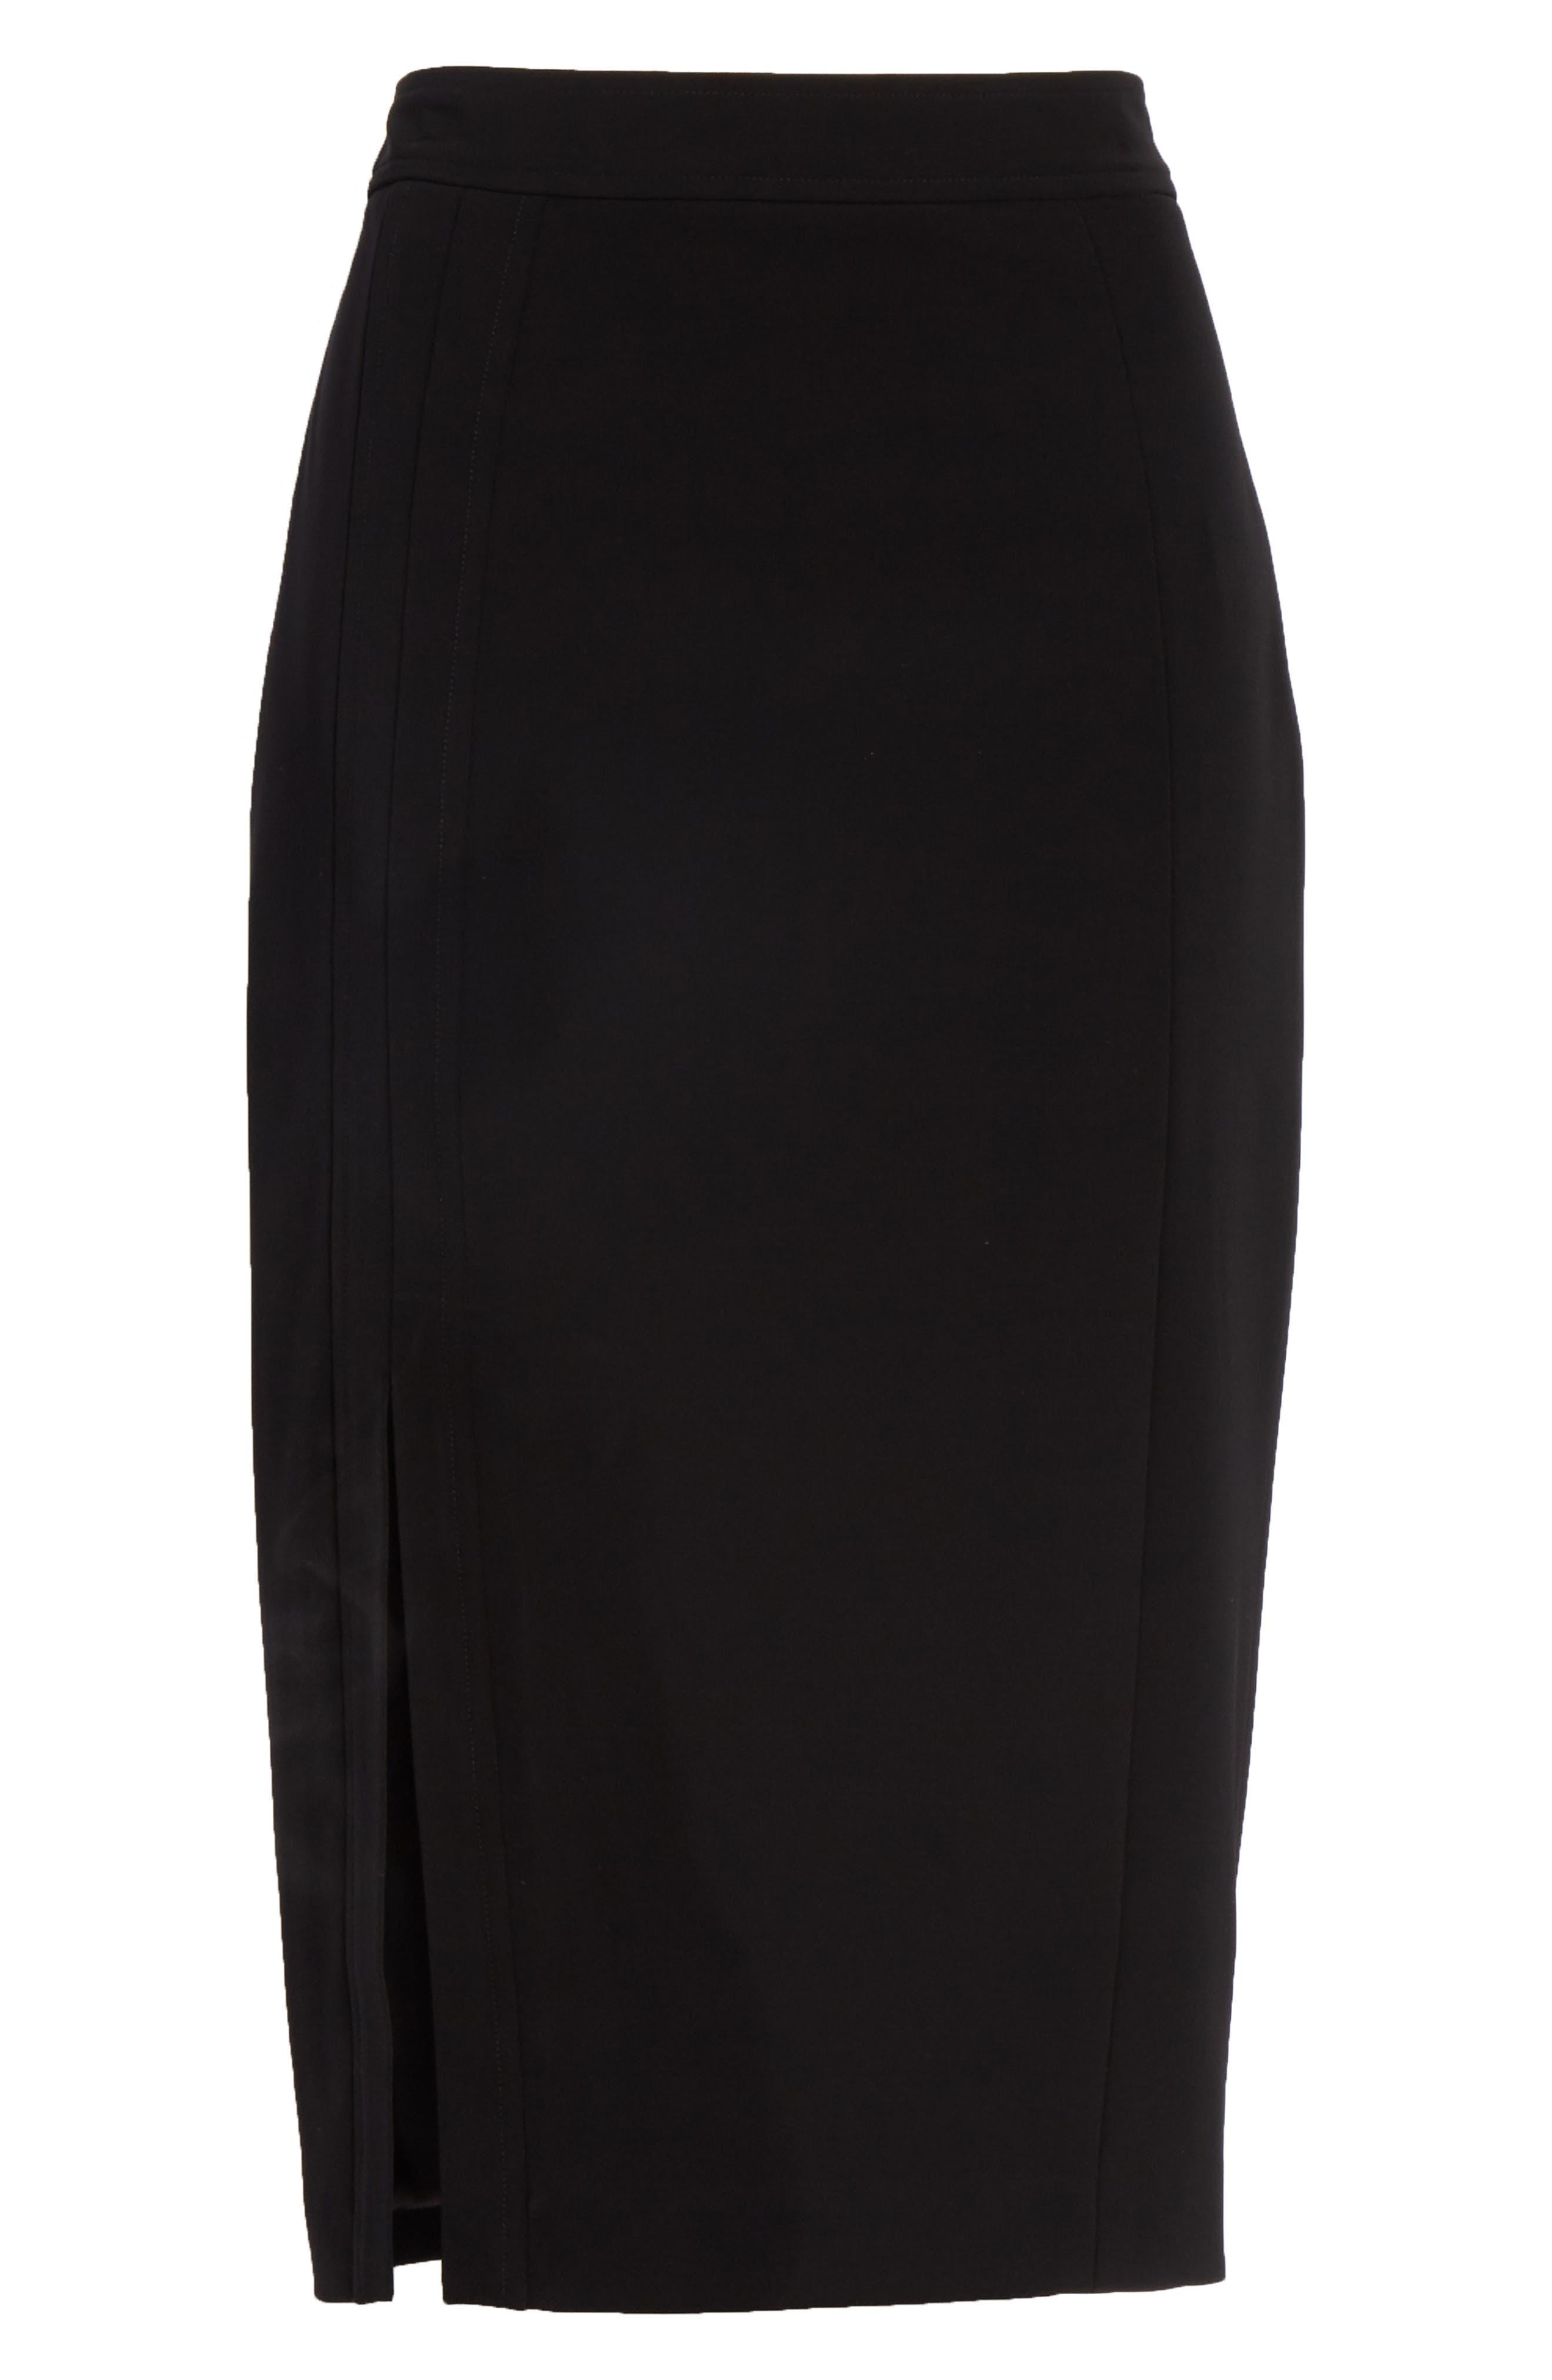 Pencil Skirt,                             Alternate thumbnail 6, color,                             Black